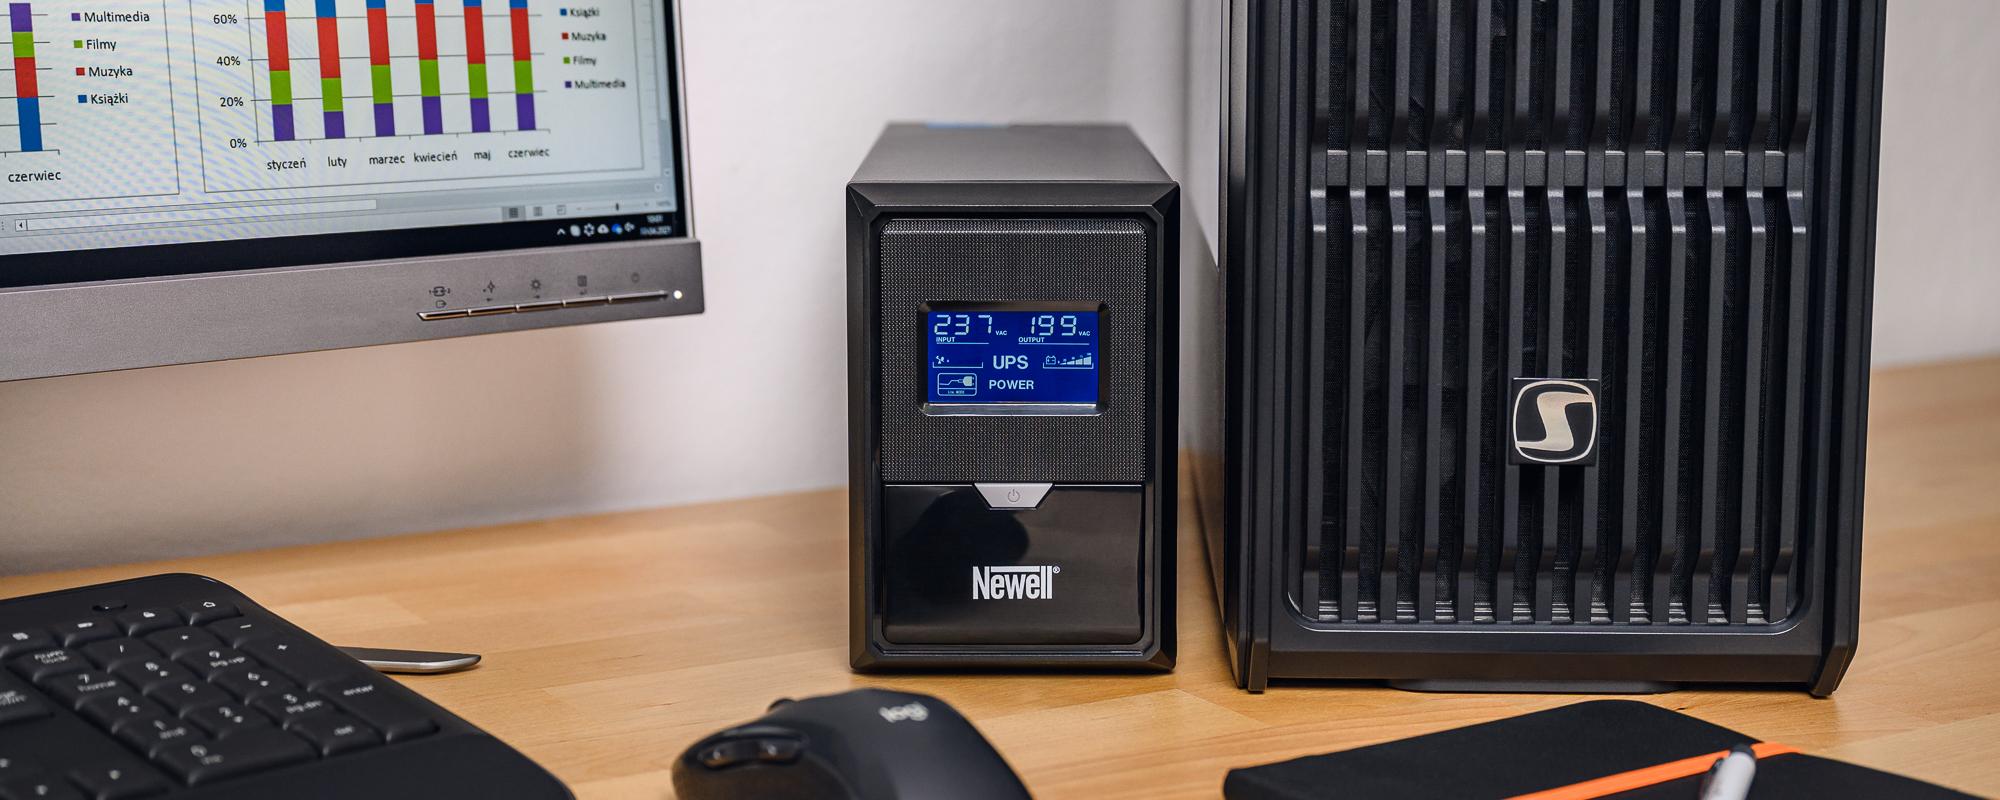 Newell Thor U650 UPS